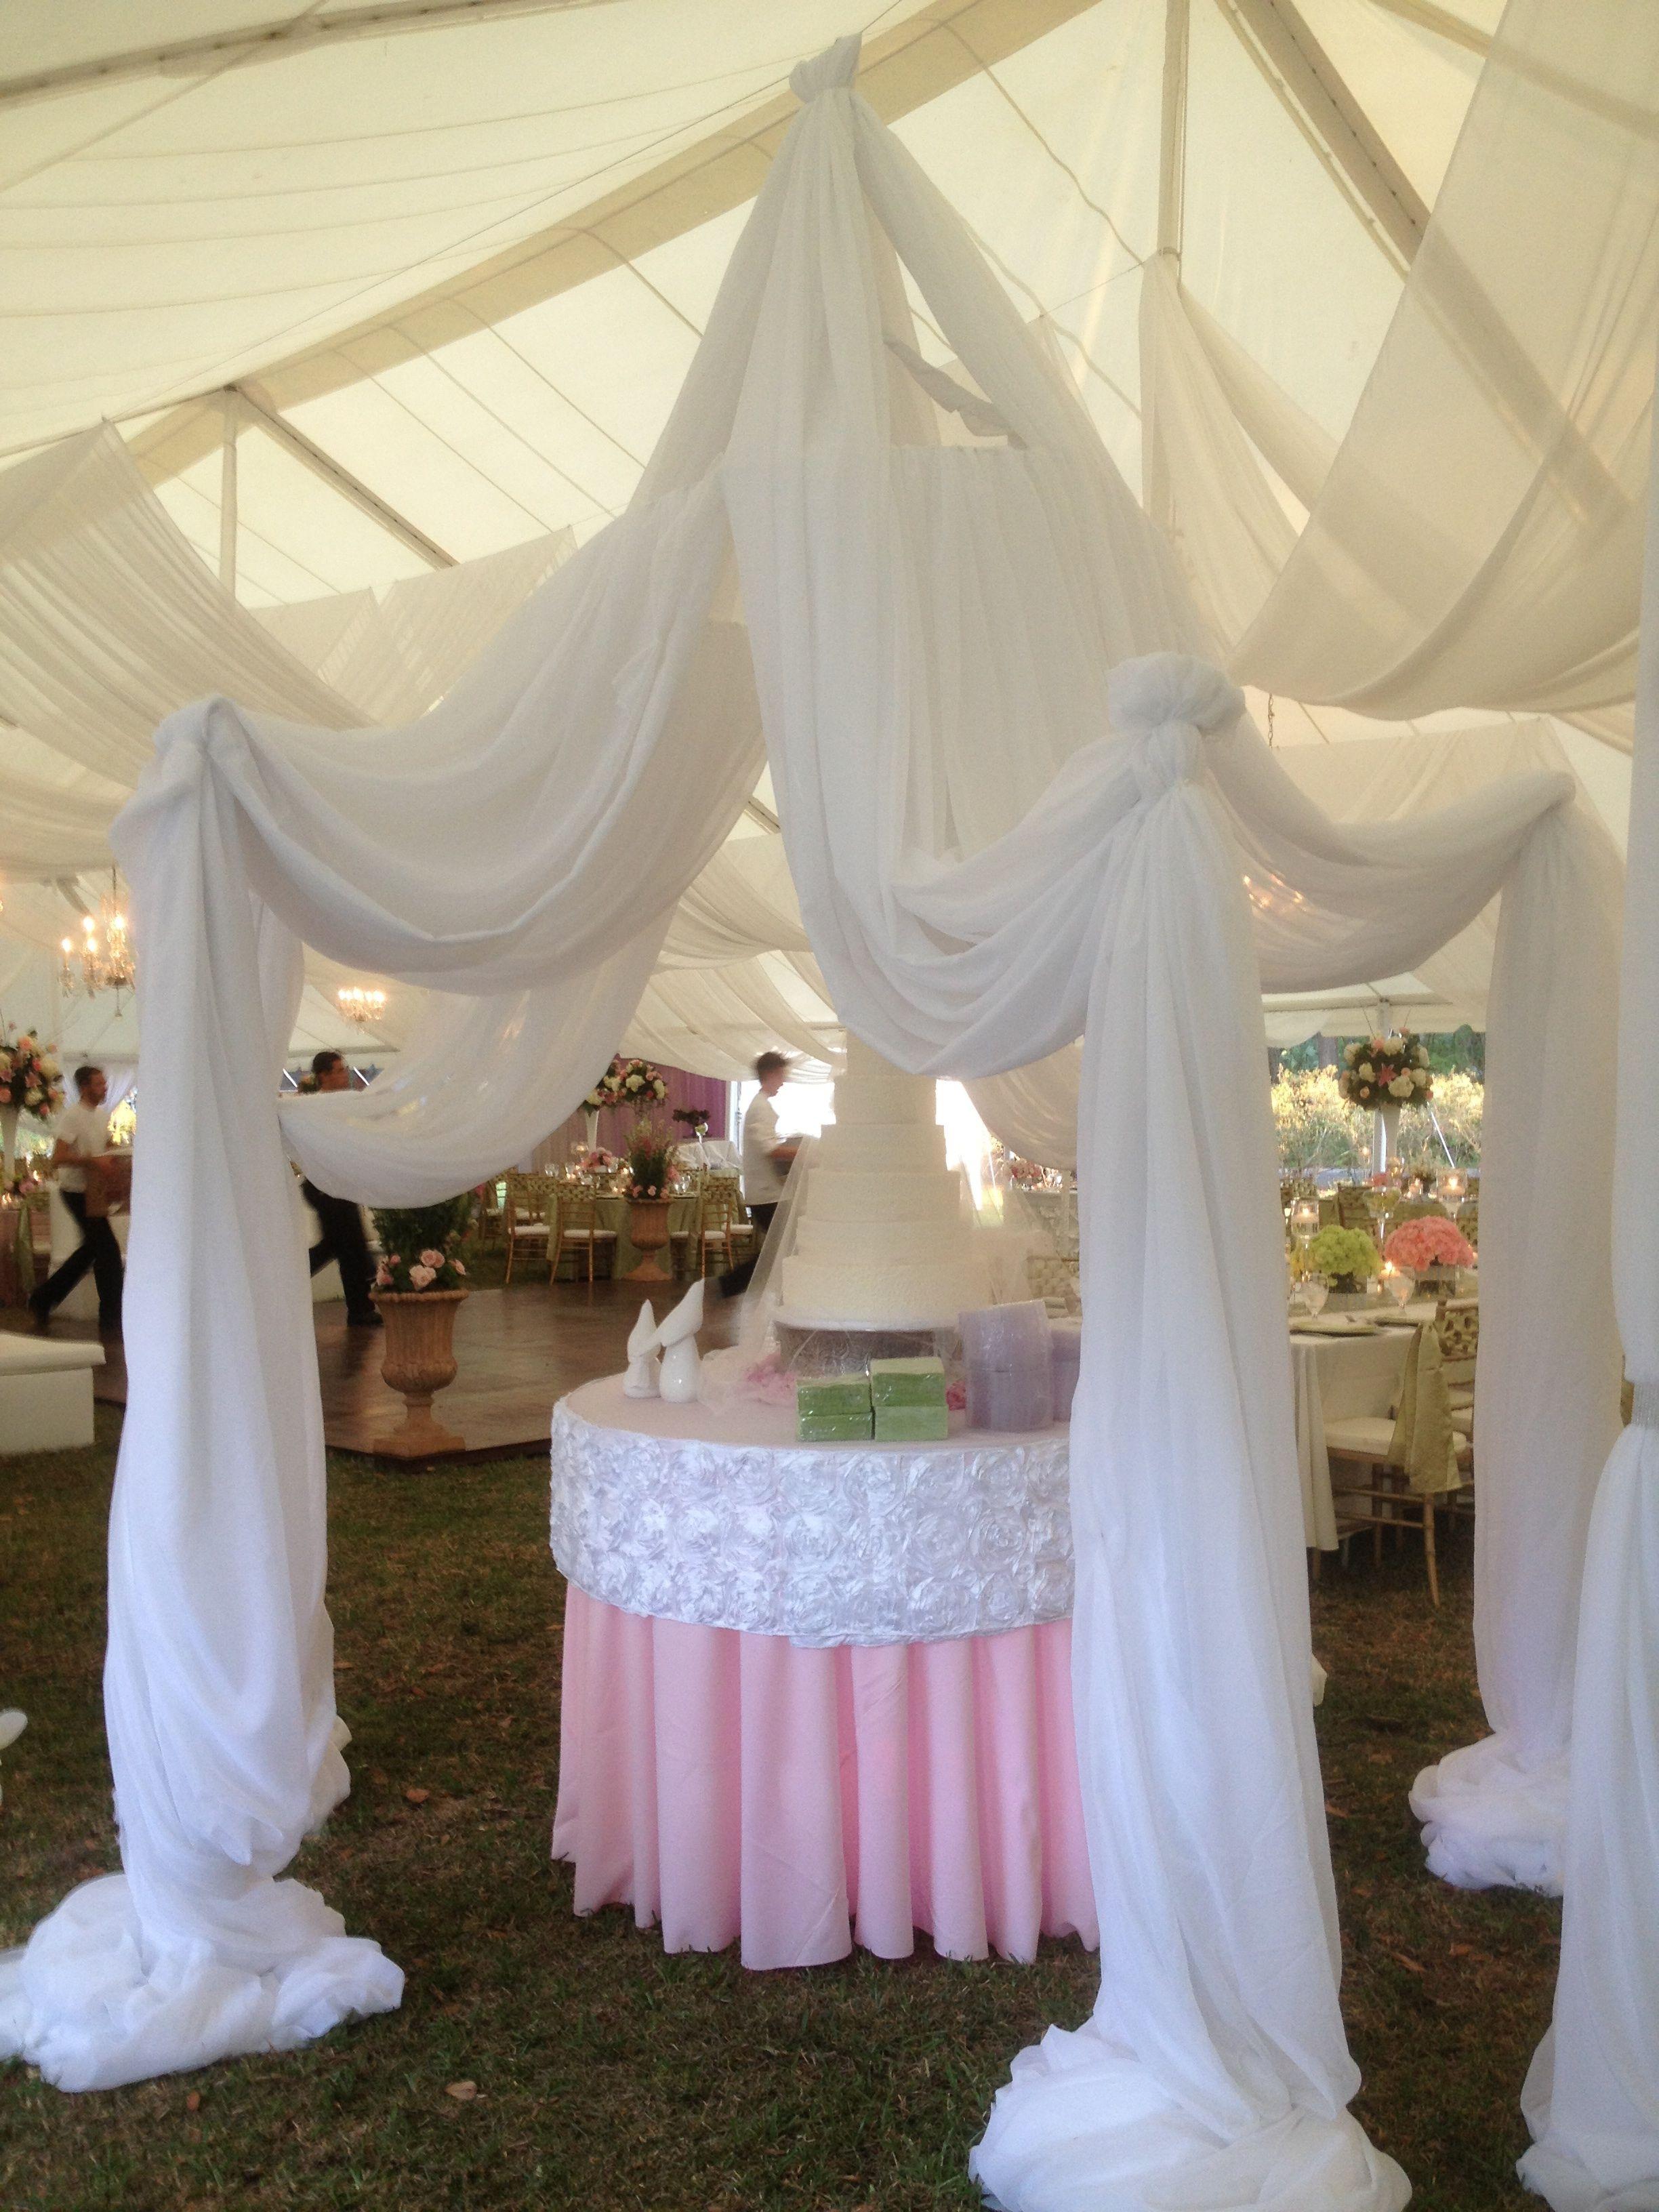 Wedding Wedding Ideas Wedding Decor Drapery Cake Stand Elegant Cake Display Drape Canopy